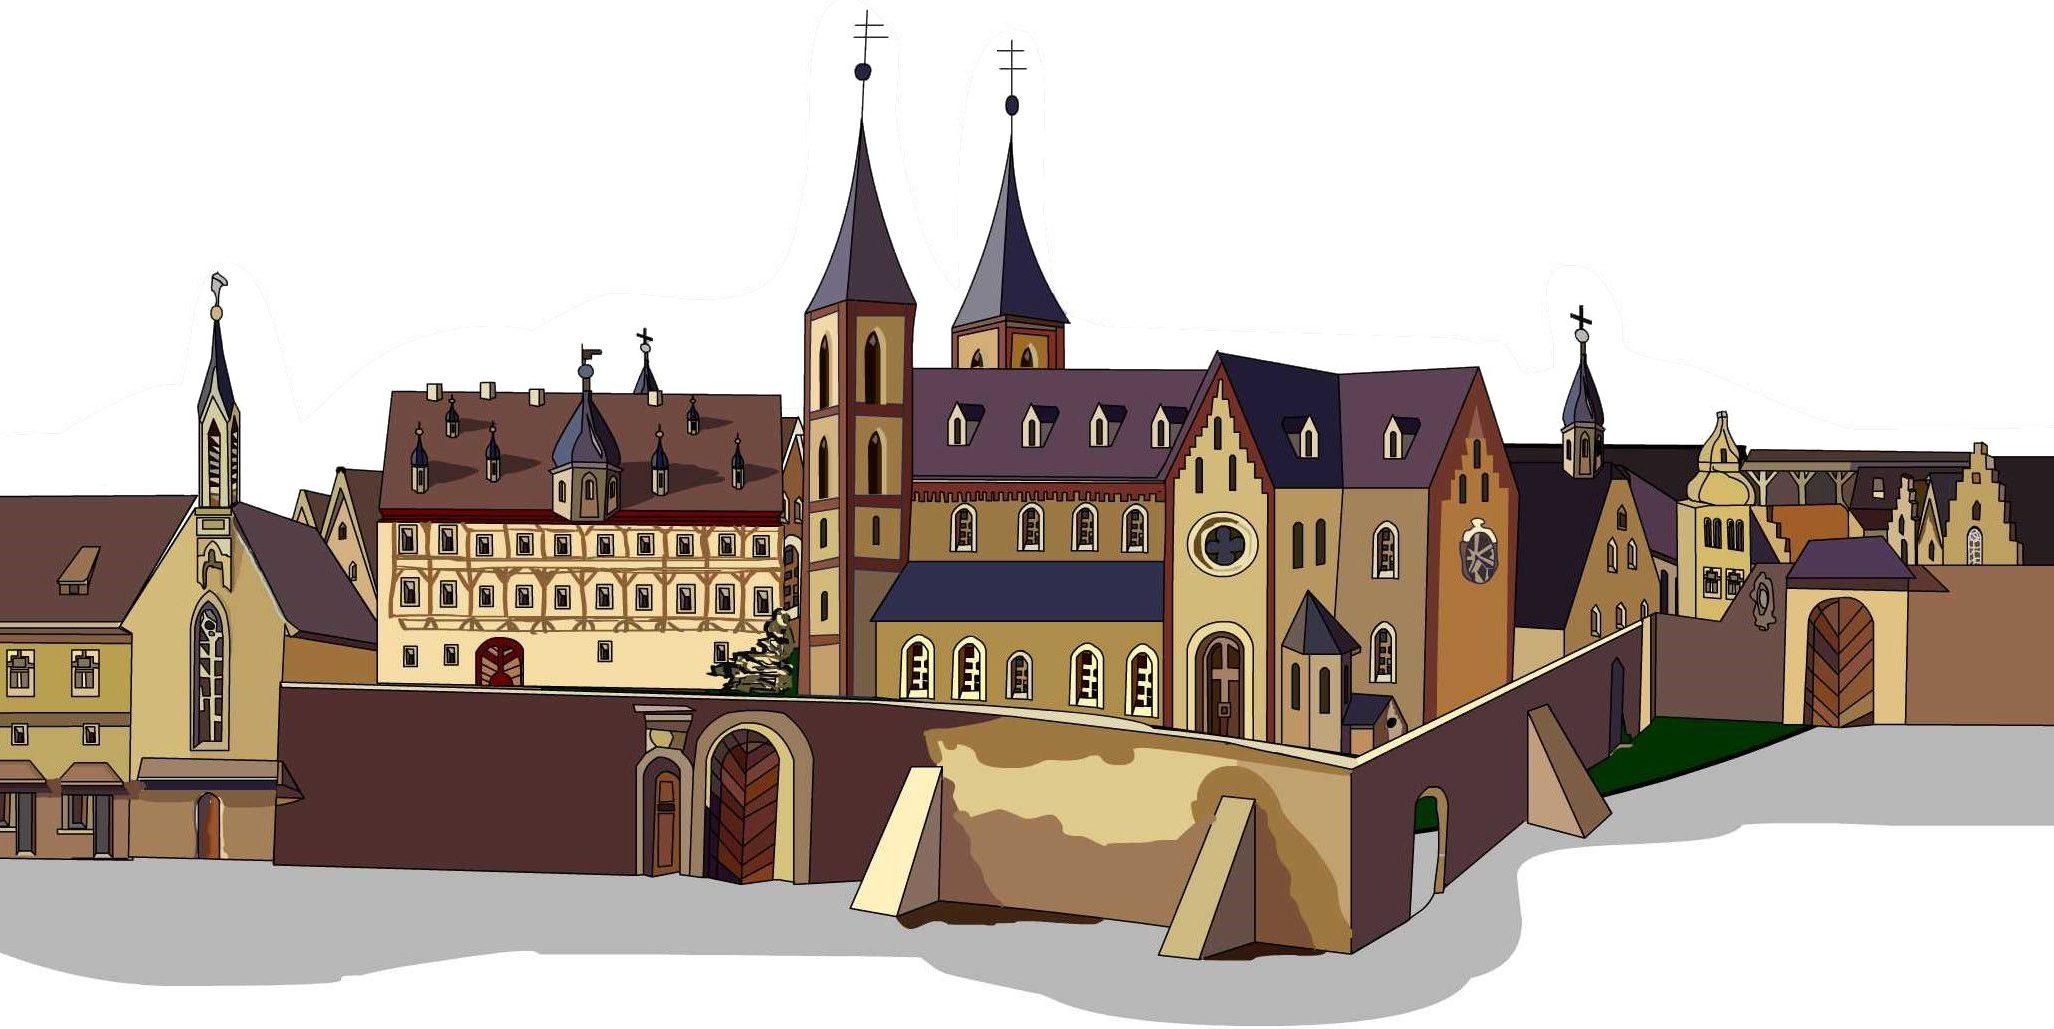 Logo for Förderverein Städtisches Museum Kitzingen e.V.